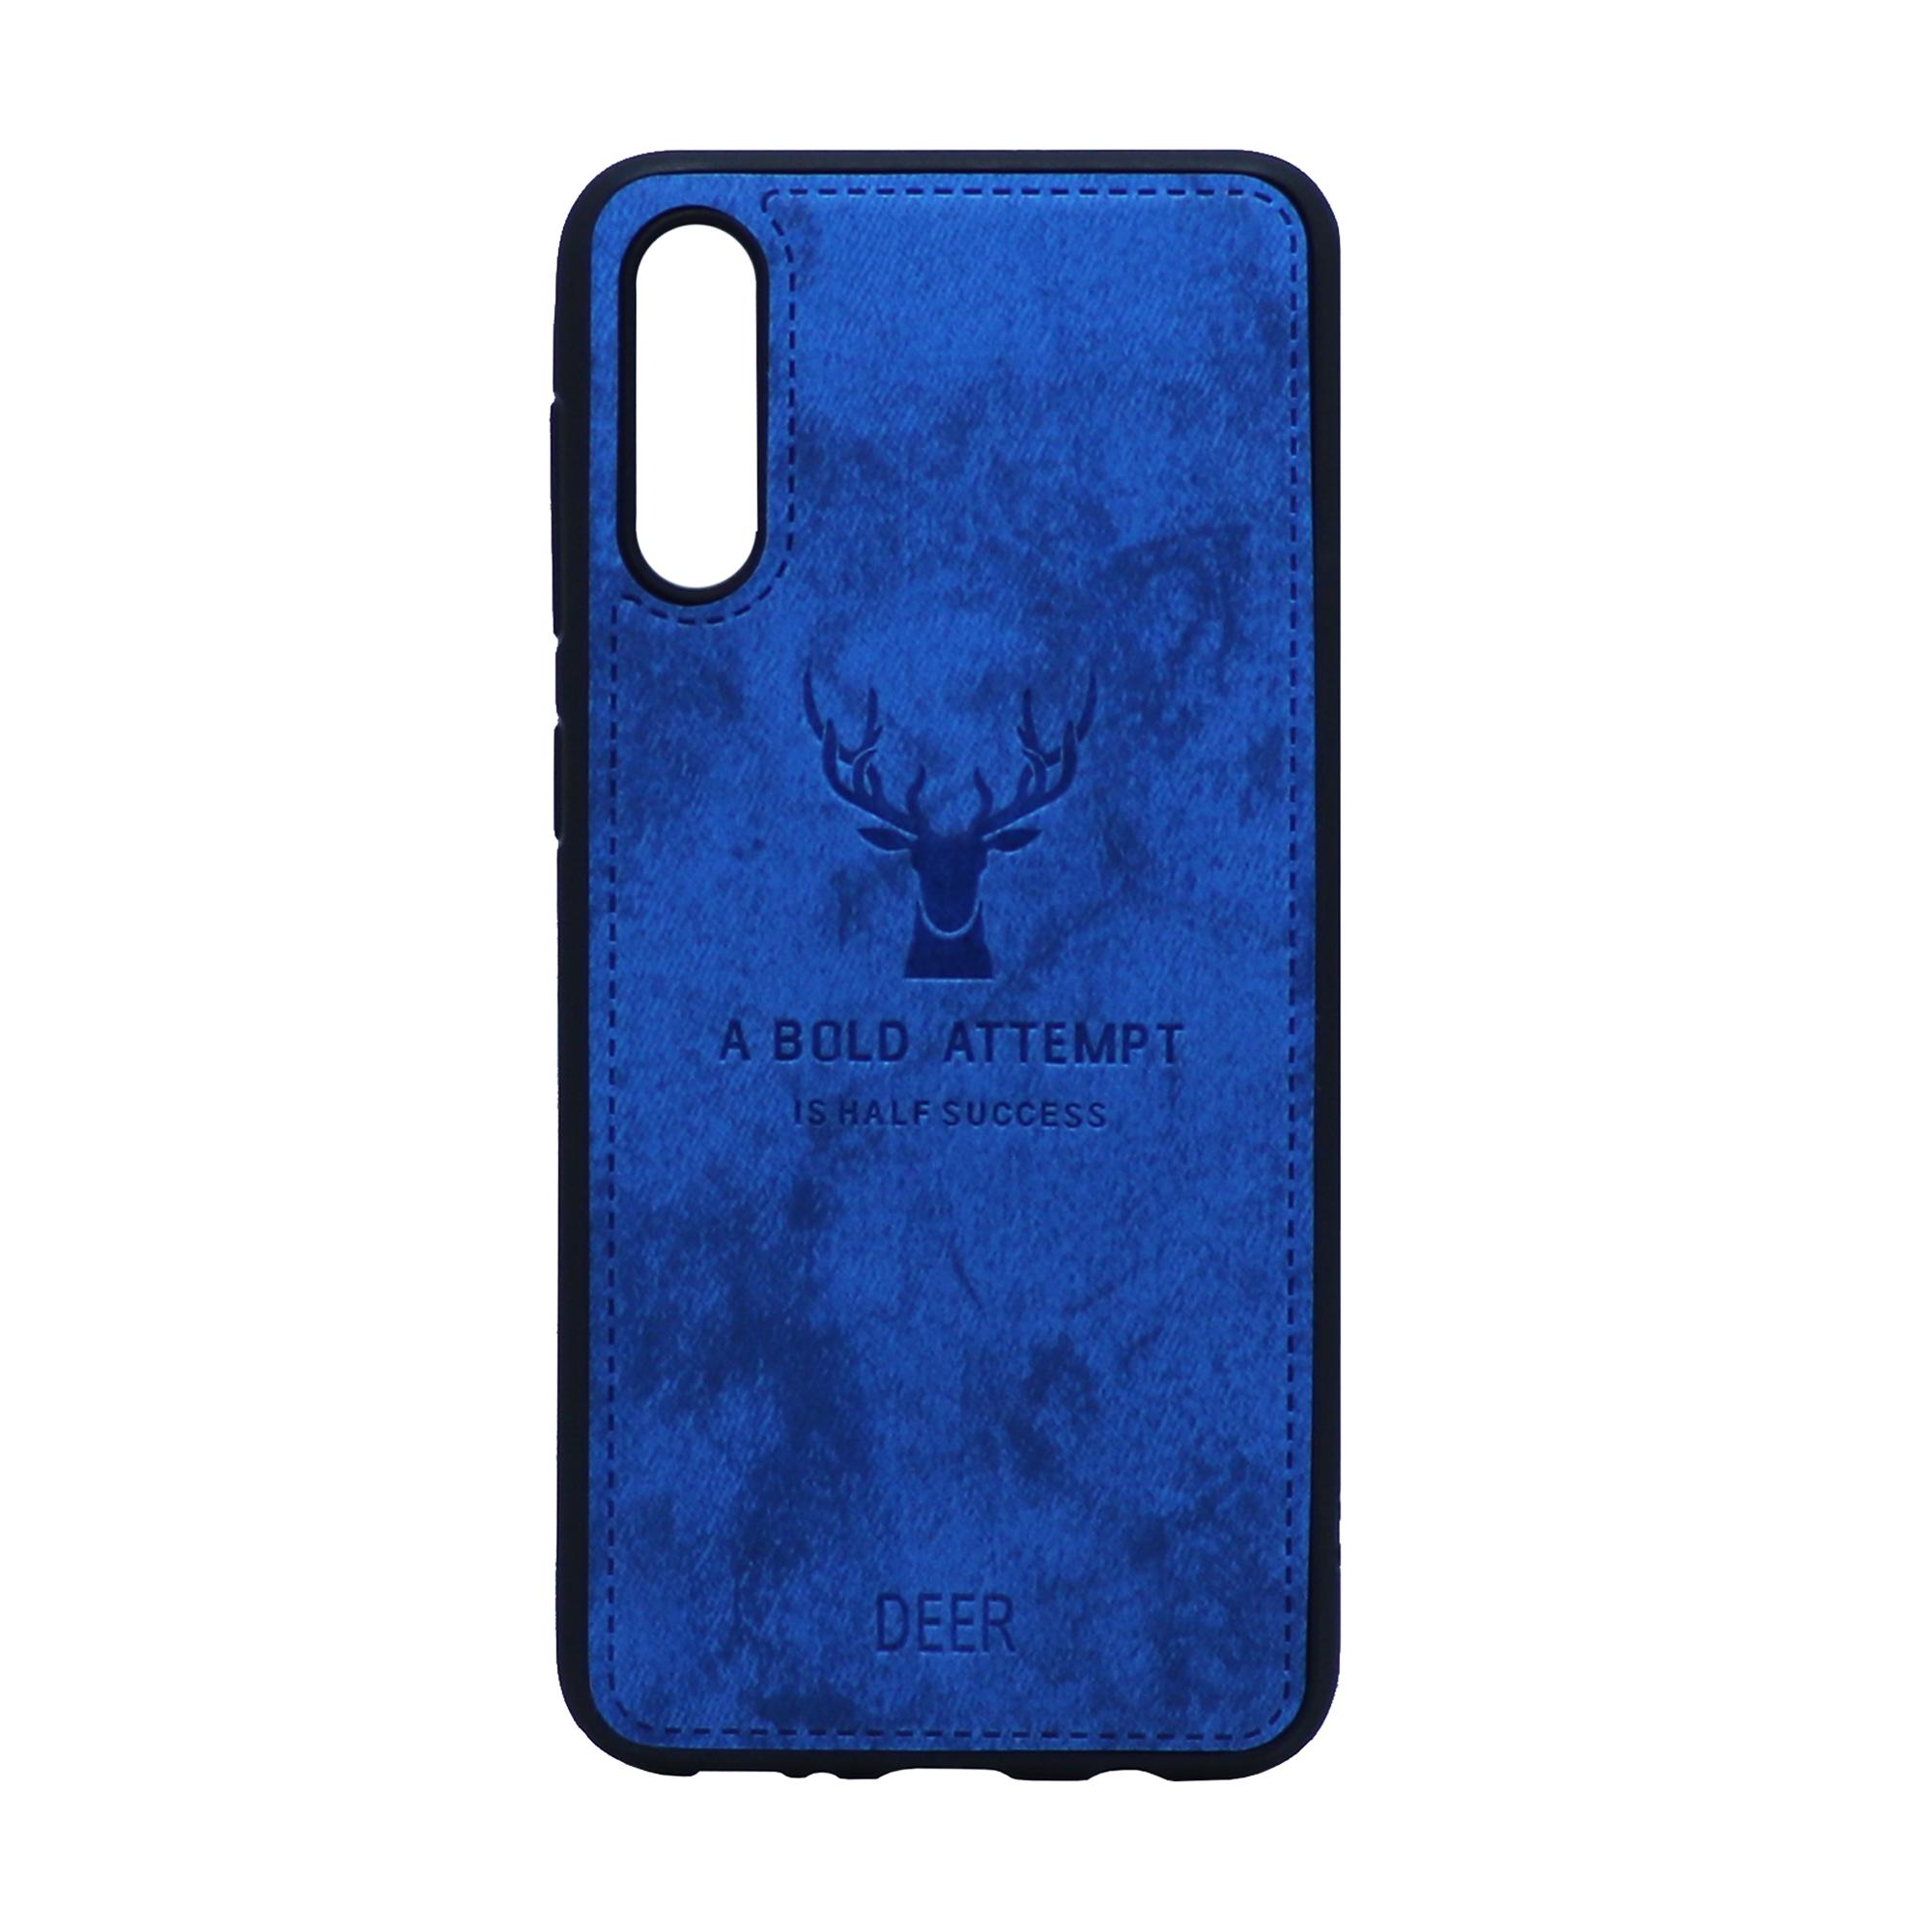 کاور طرح deer-1 مناسب برای گوشی موبایل سامسونگ galaxy A50